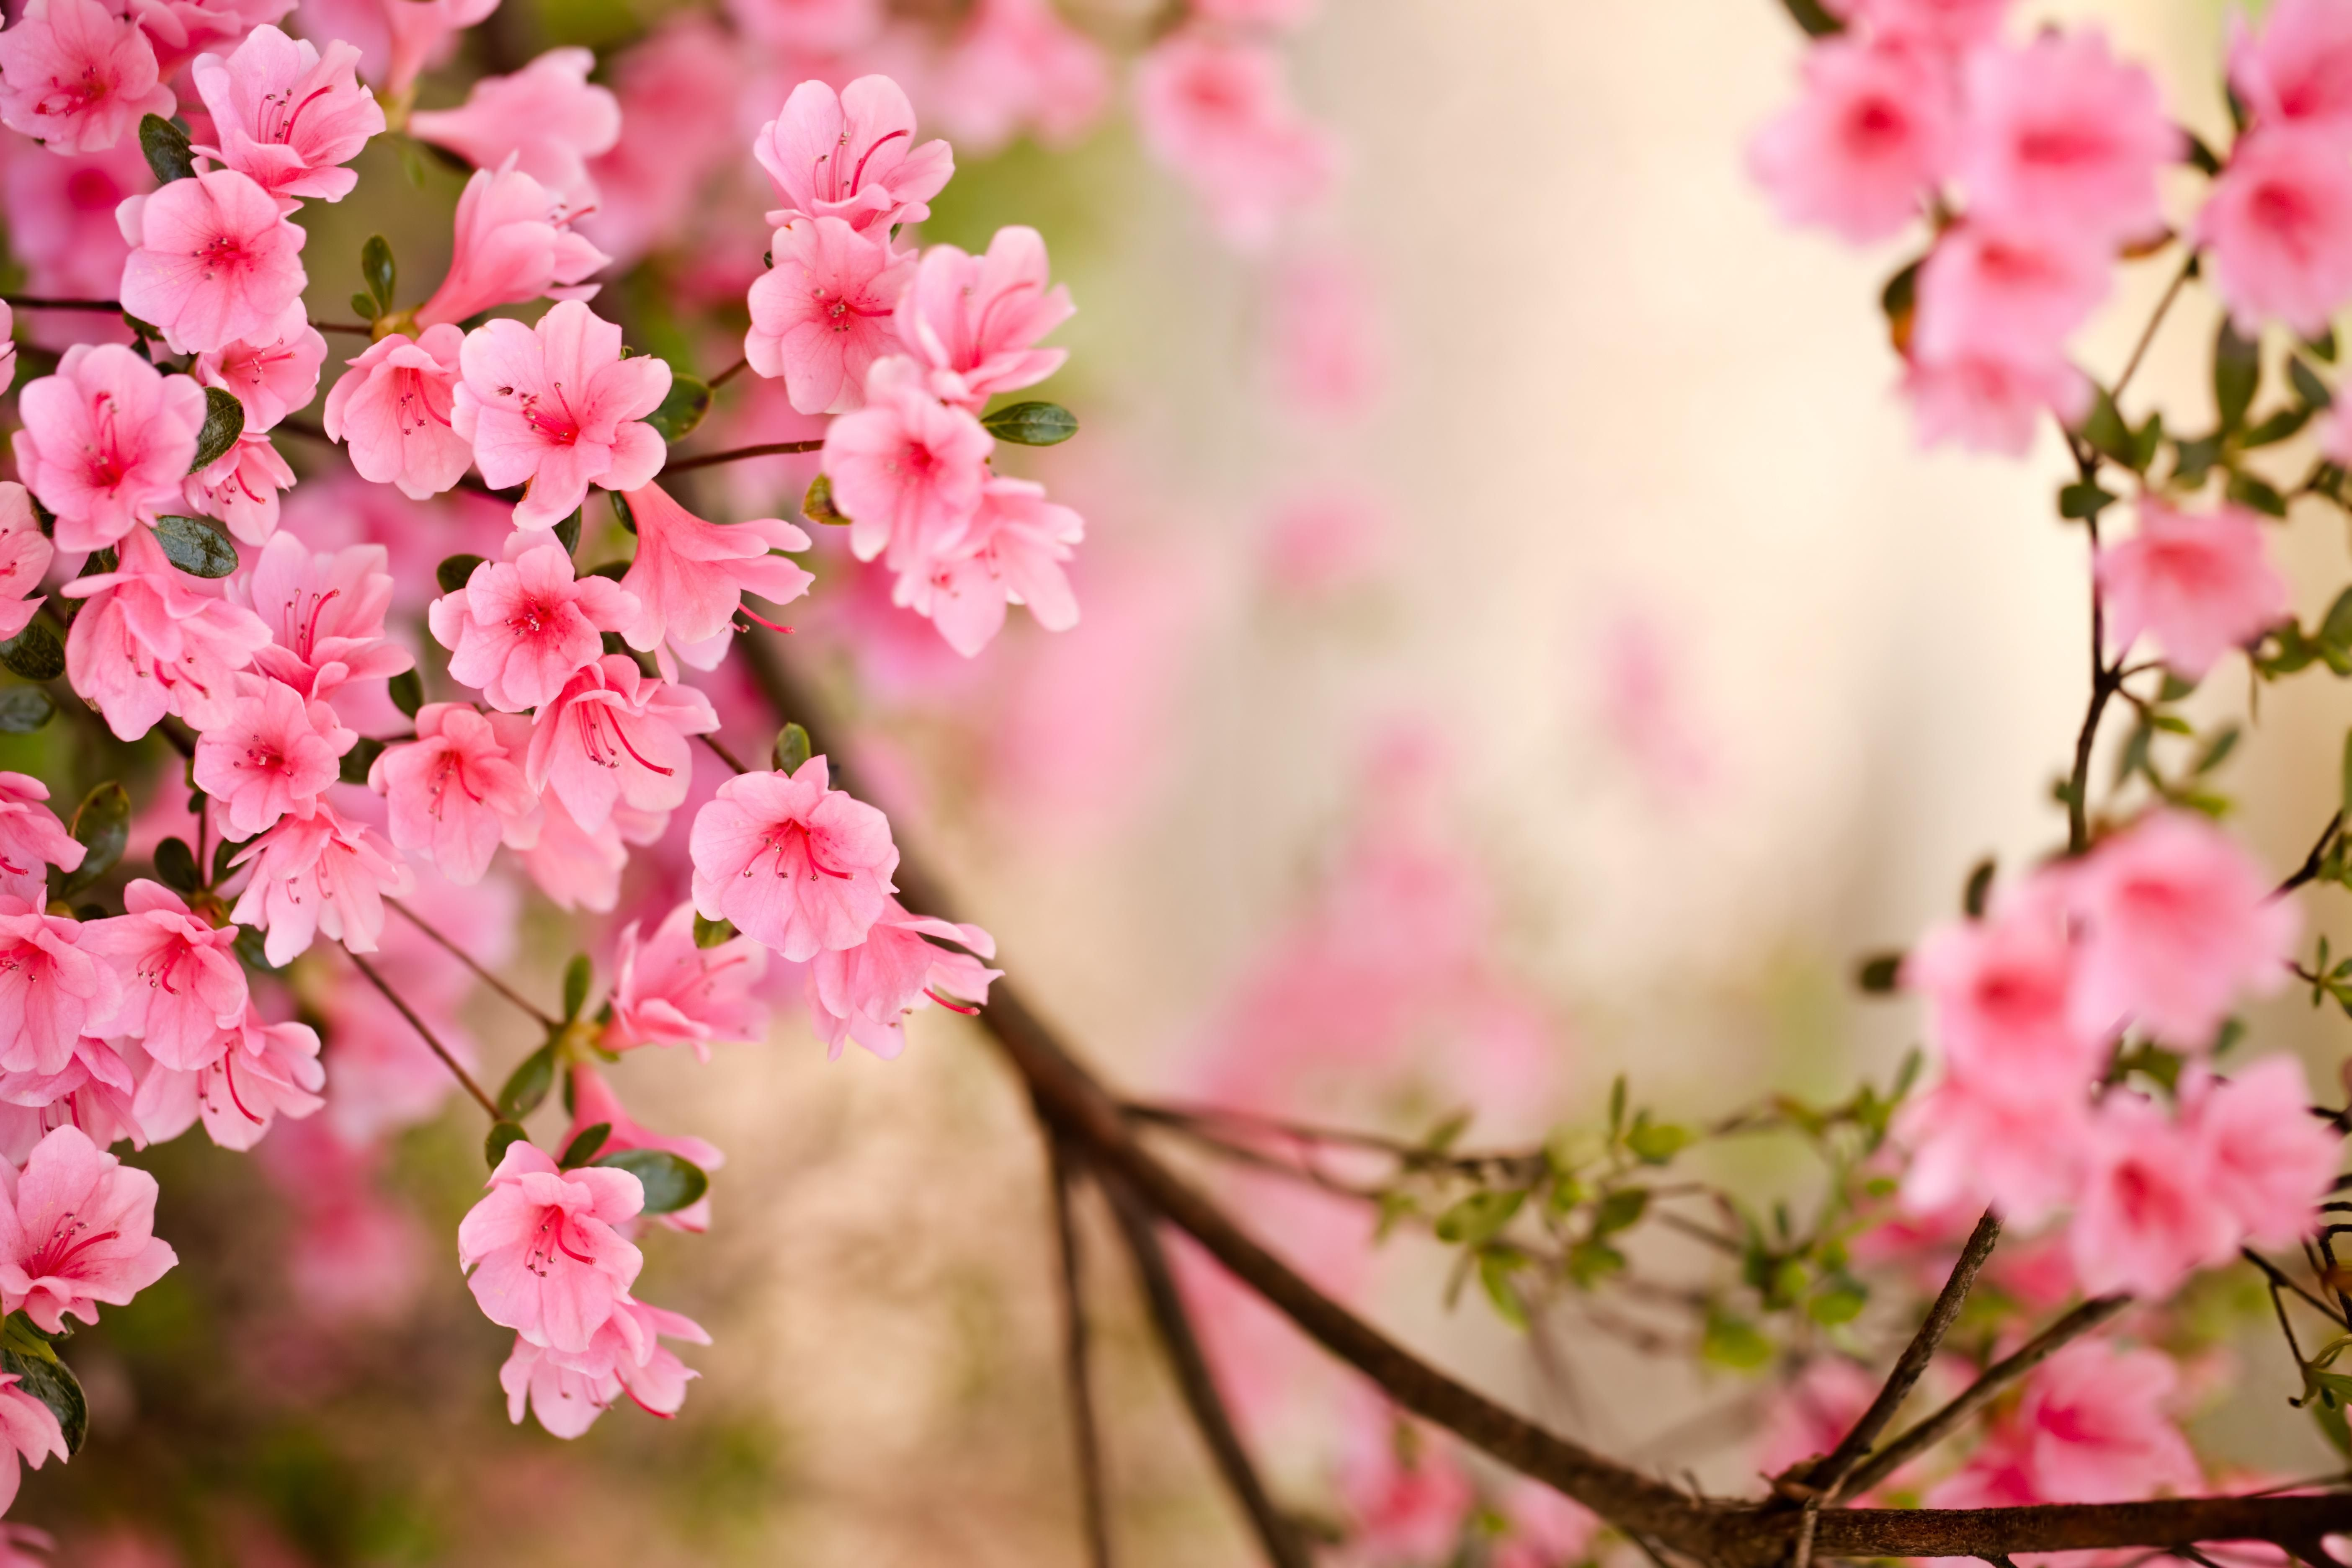 Songs of spring early spring flowers flowers uk and spring songs of spring flowers ukbeautifulgoogle mightylinksfo